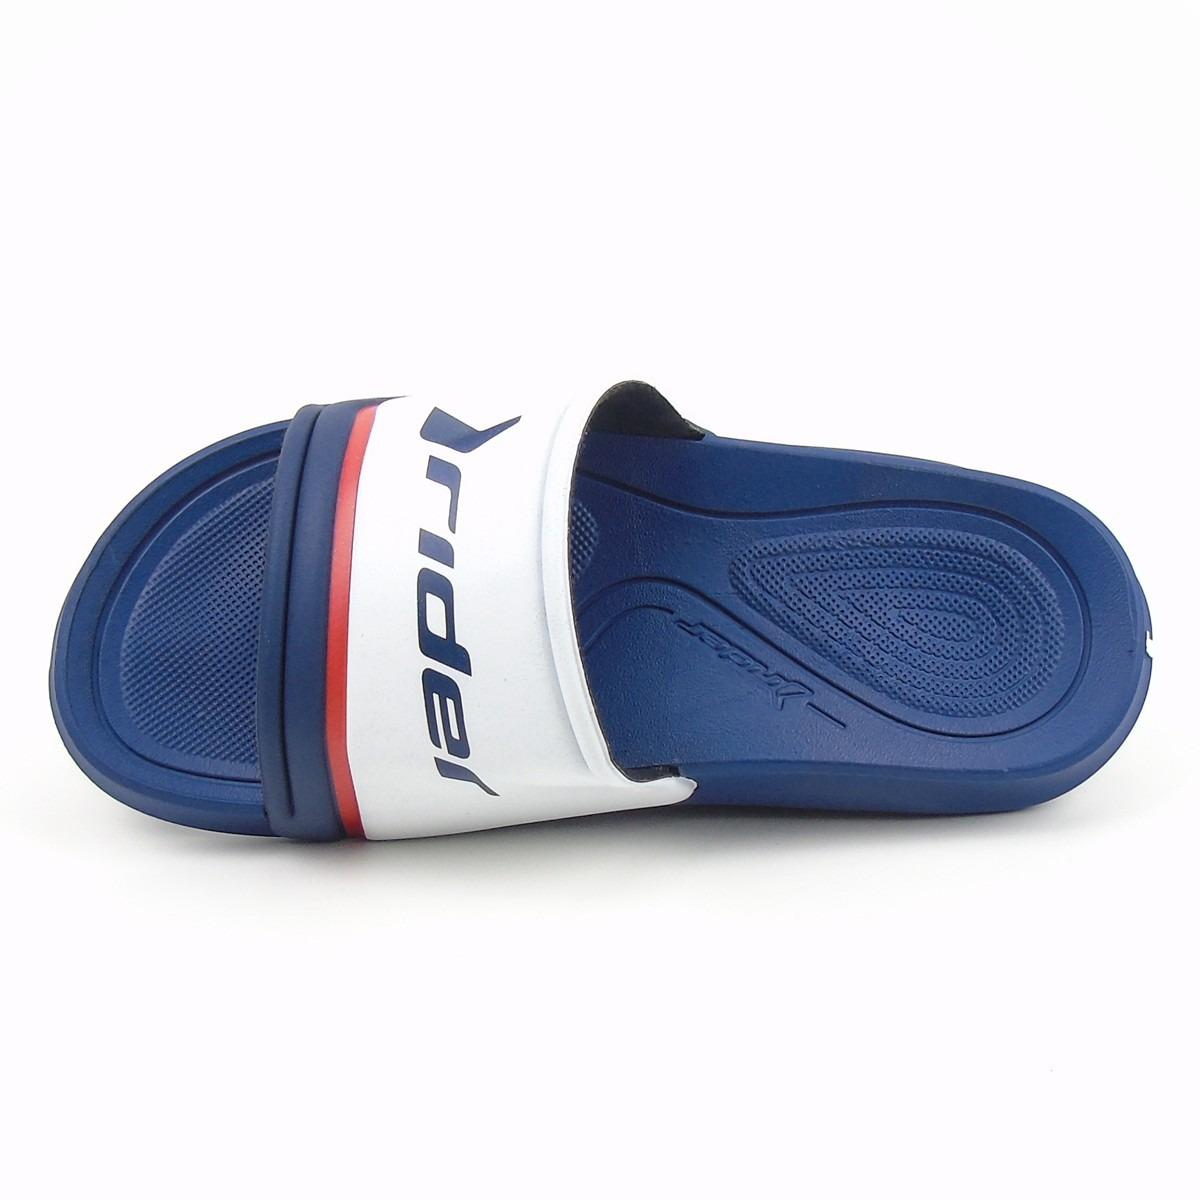 6de458950 chinelo slide masculino rider 11307 azul macio confortavel. Carregando zoom.